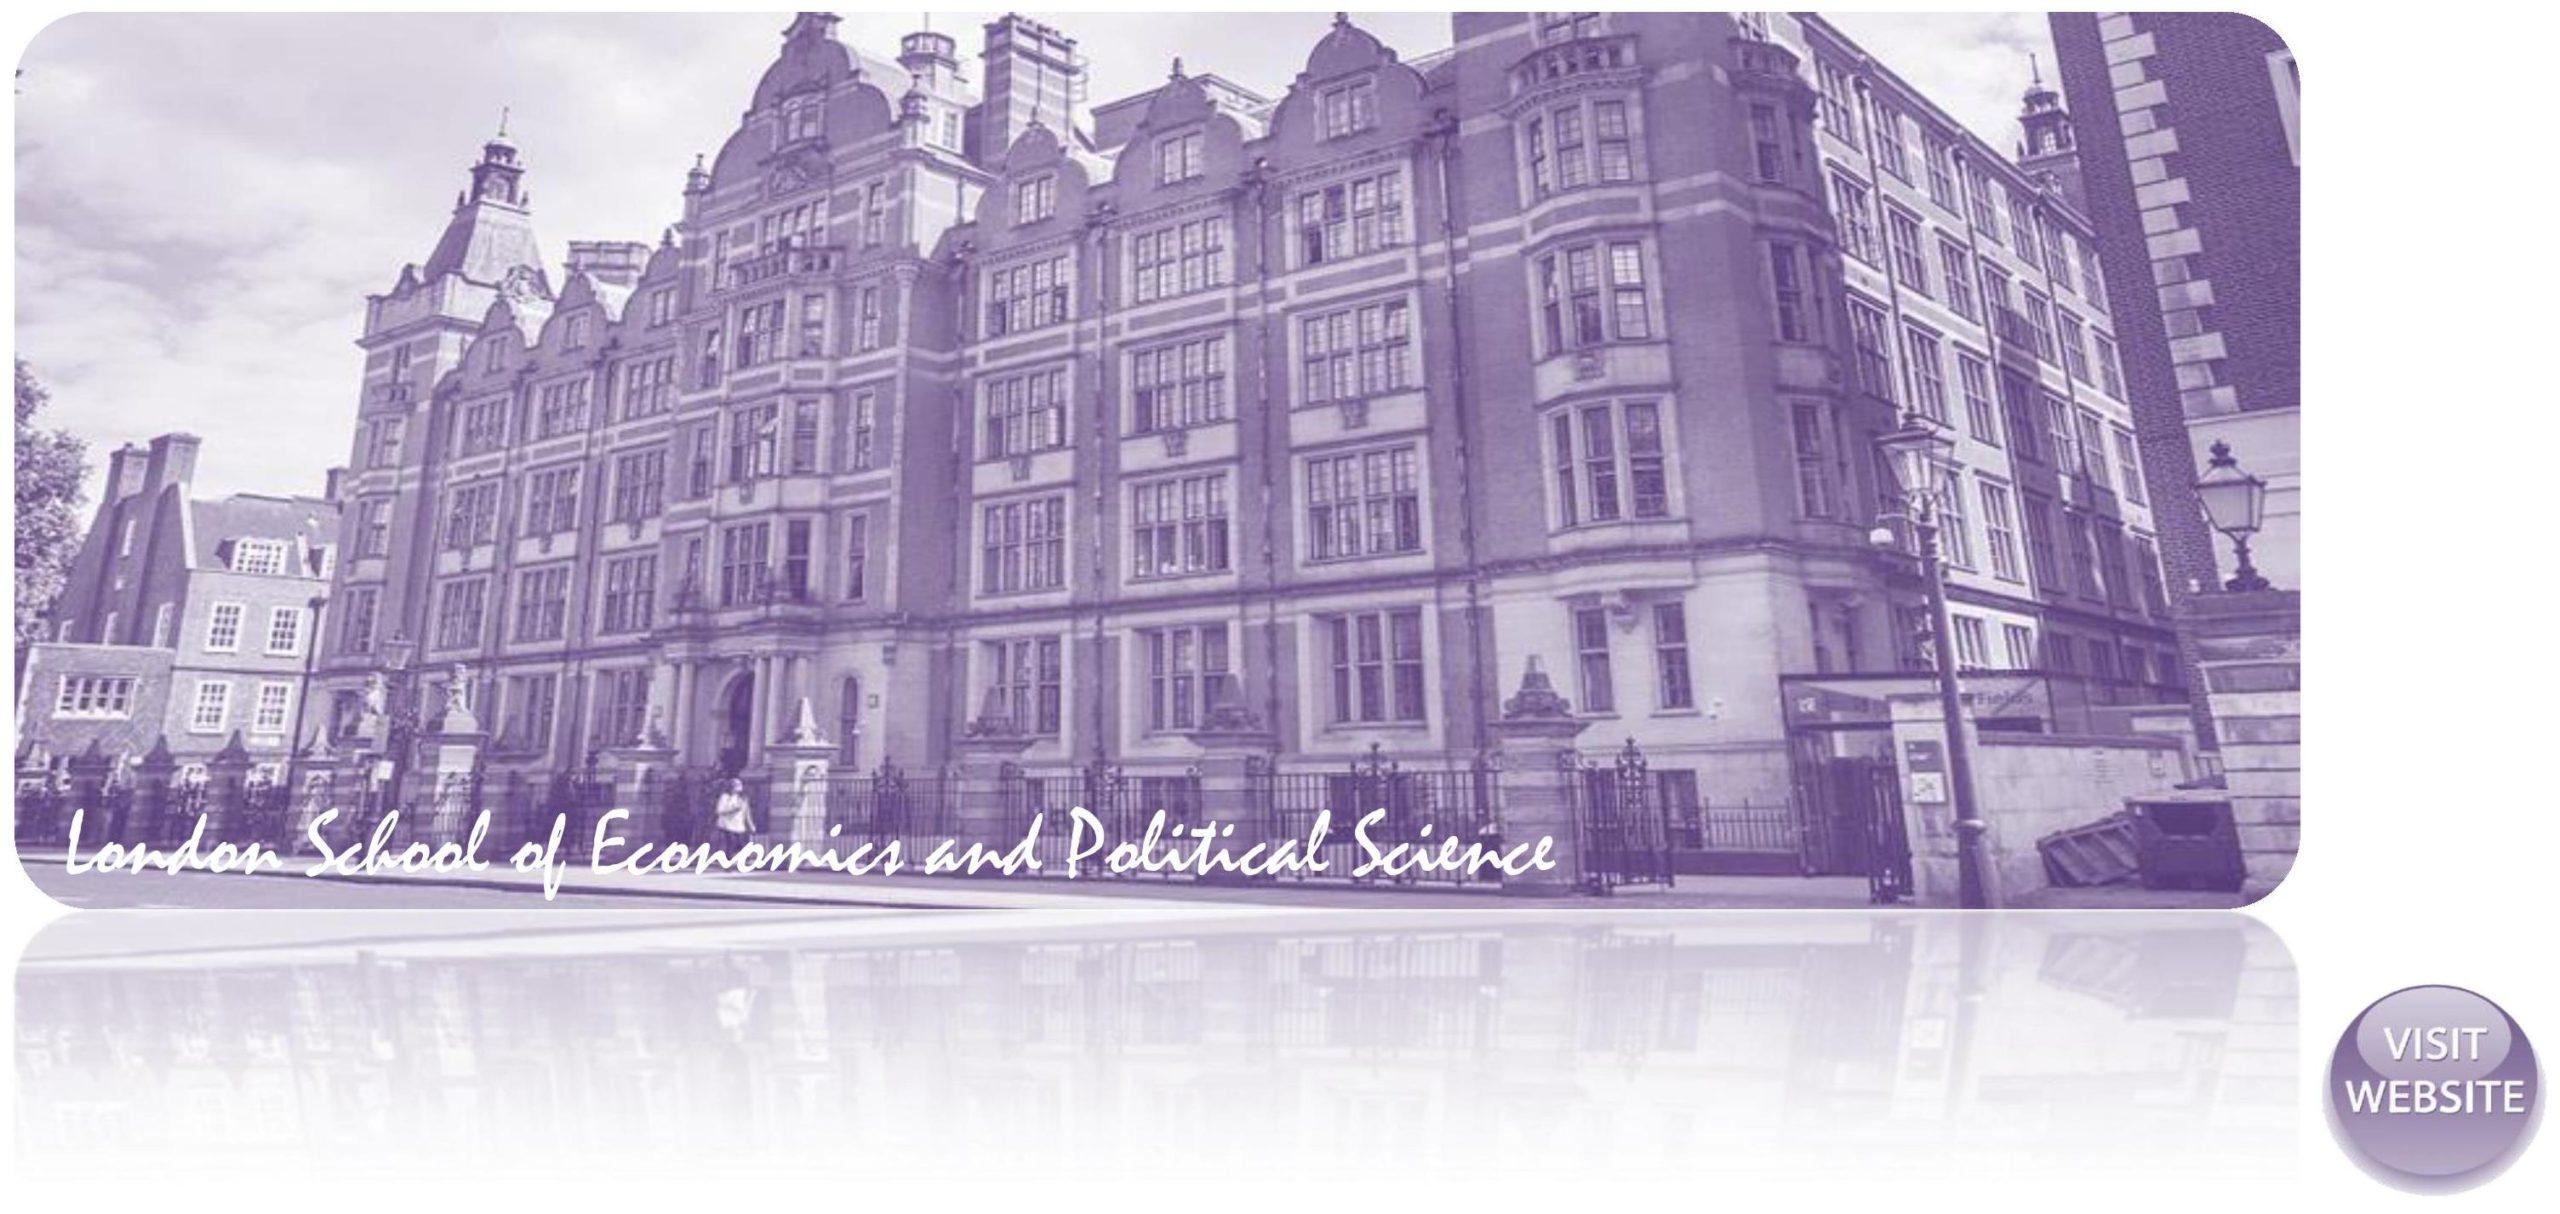 London School of Economics and Political Science UK